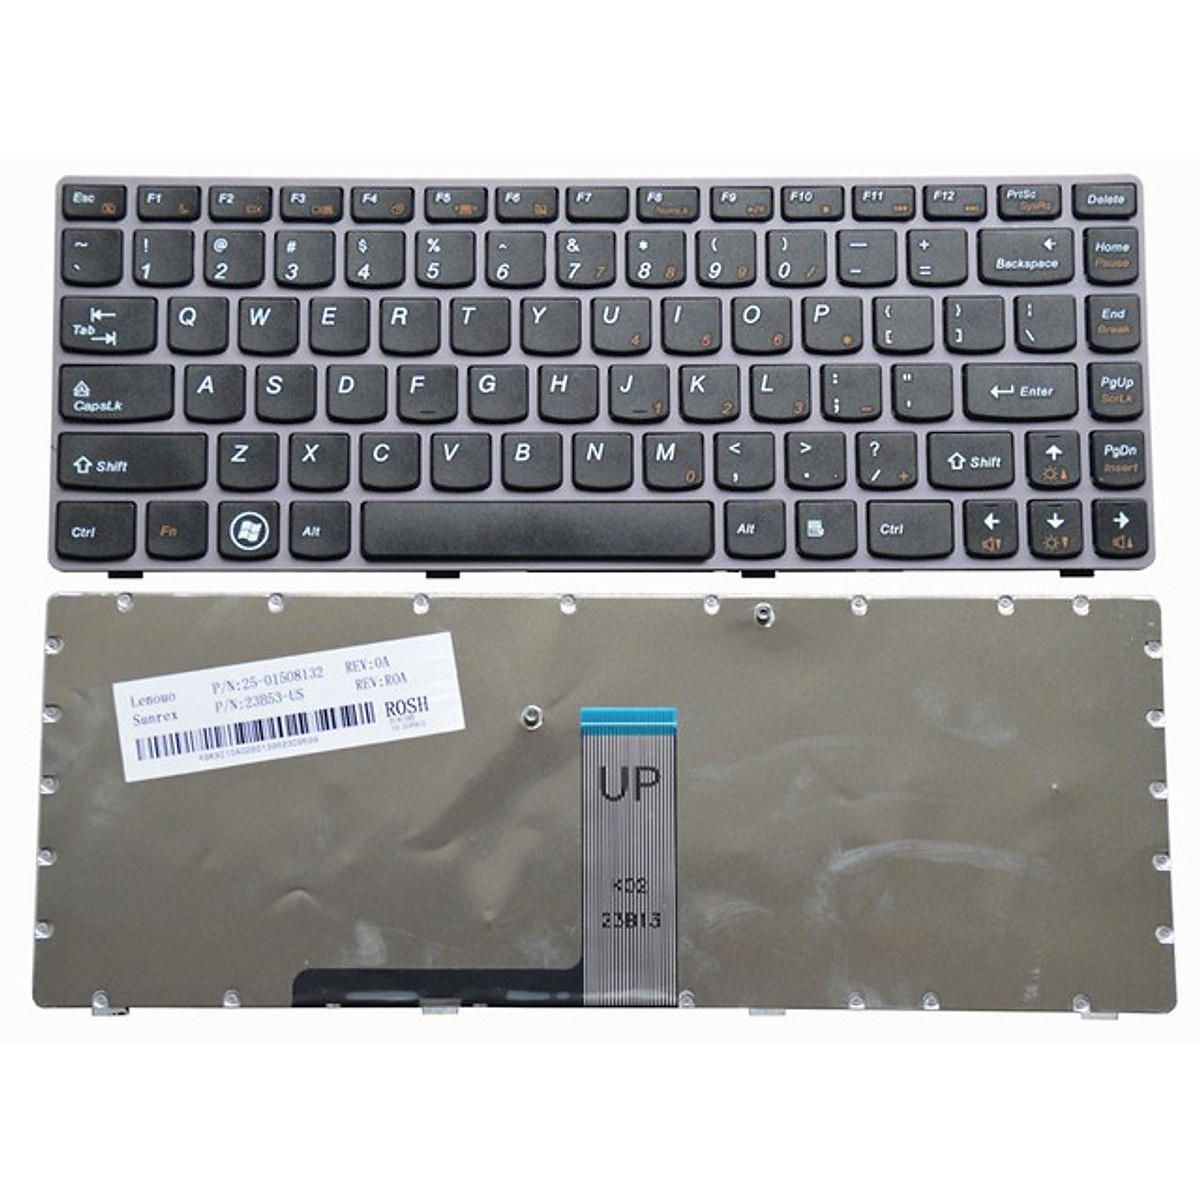 Bàn dùng cho phím laptop Lenovo Ideapad Z370, Z475